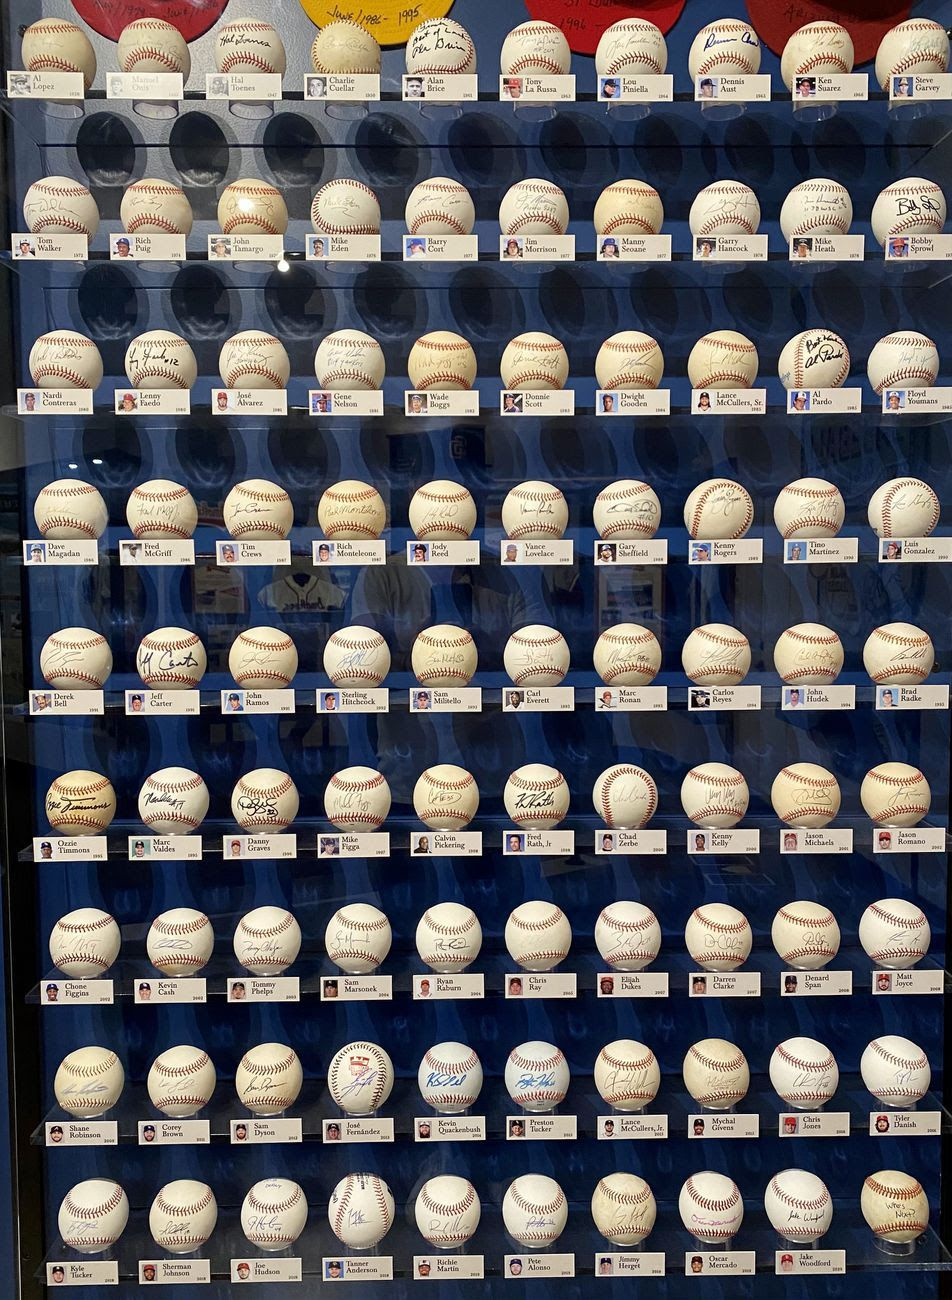 A glass display full of autographed baseballs.